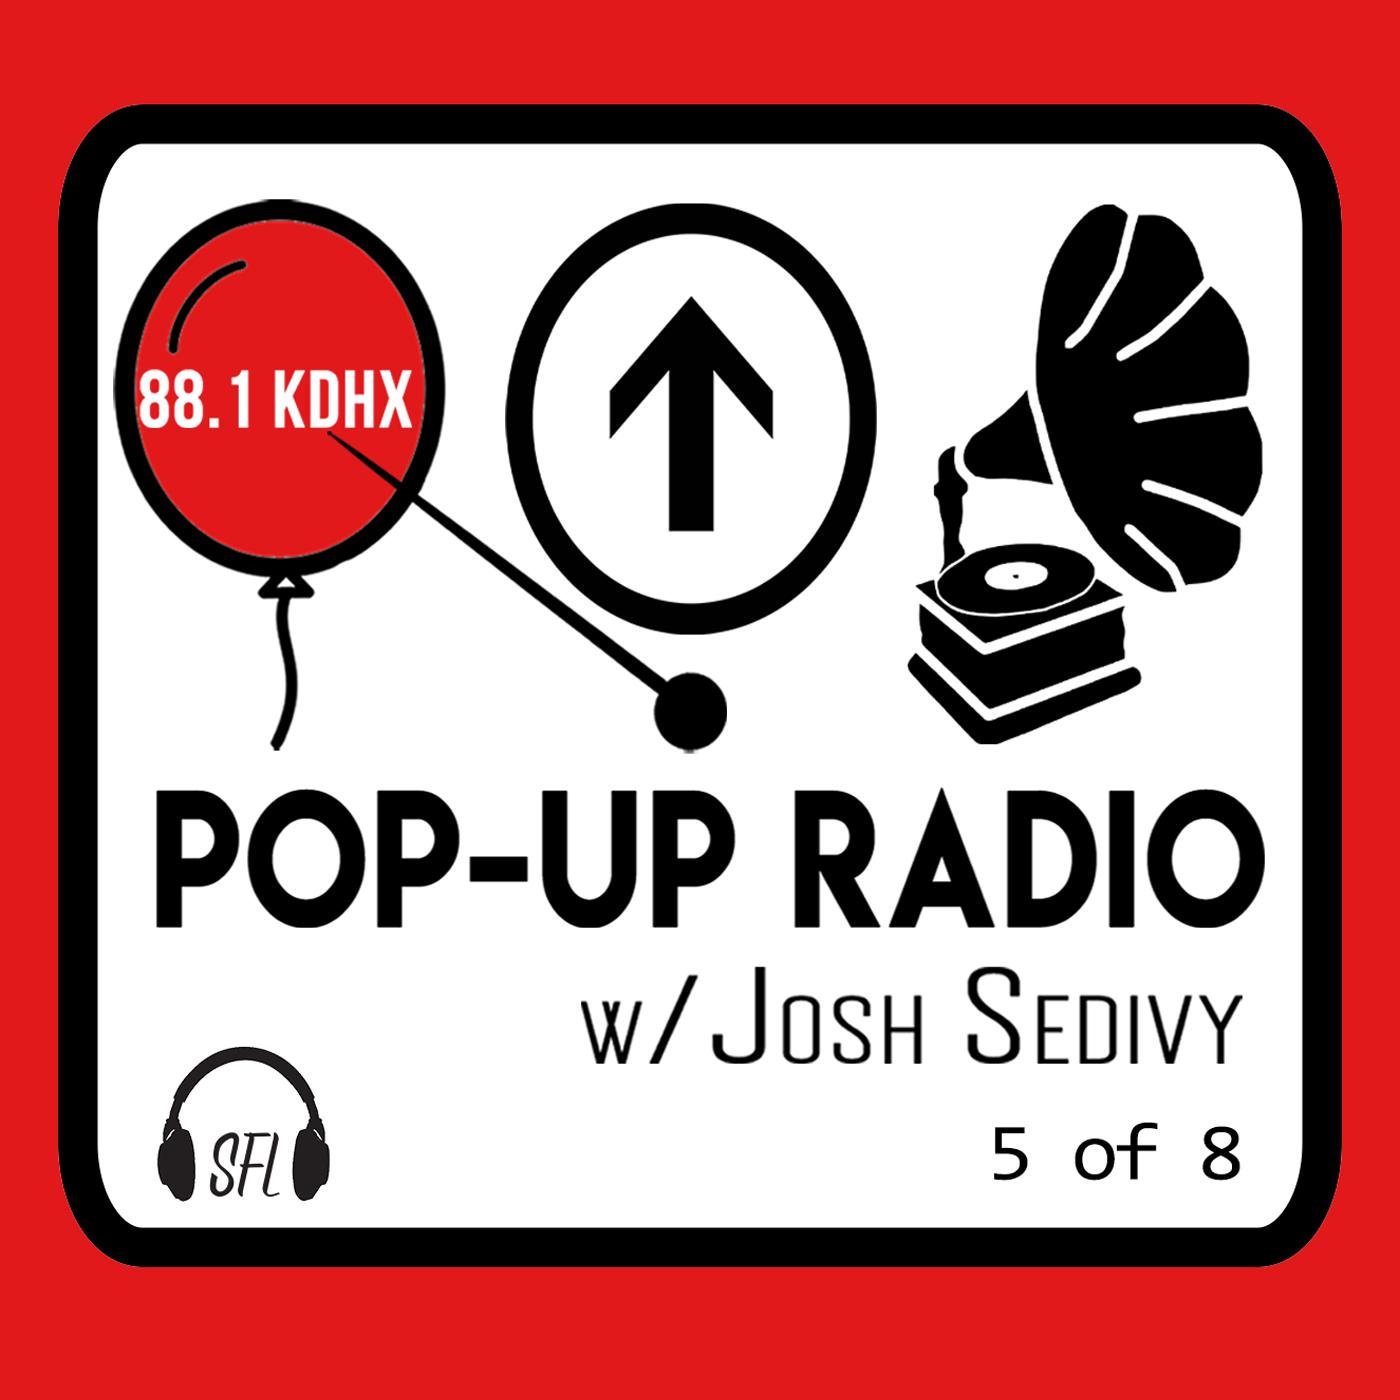 Pop-Up Radio on KDHX - Episode 5